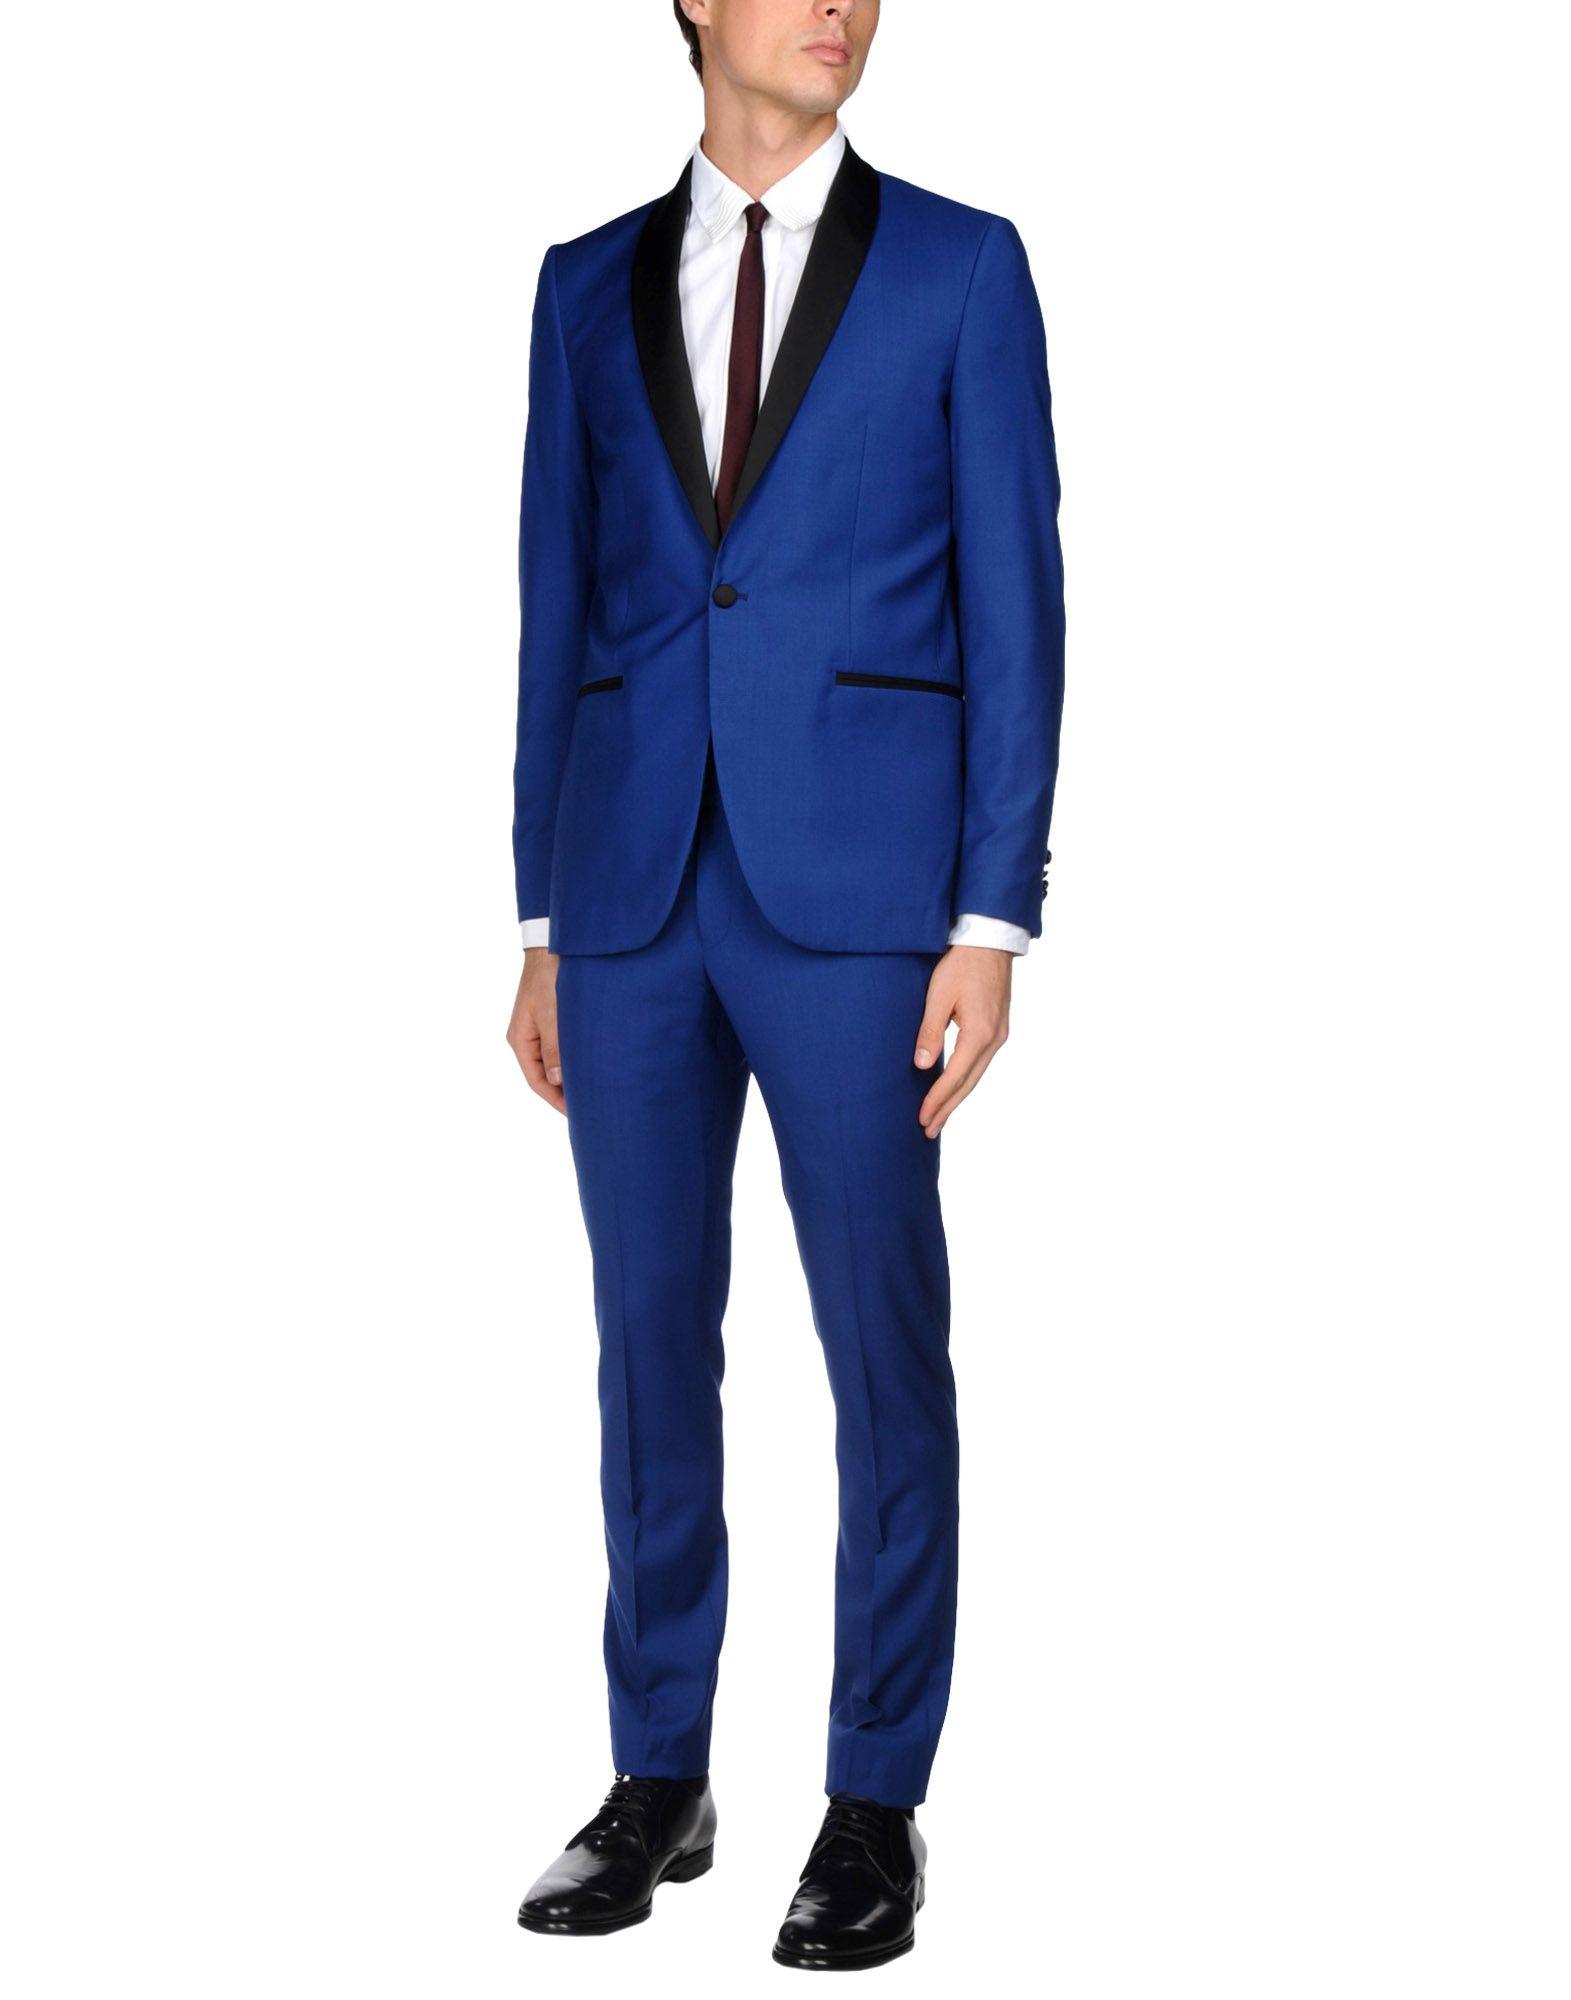 Abito The Suits Antwerp Uomo - Acquista online su